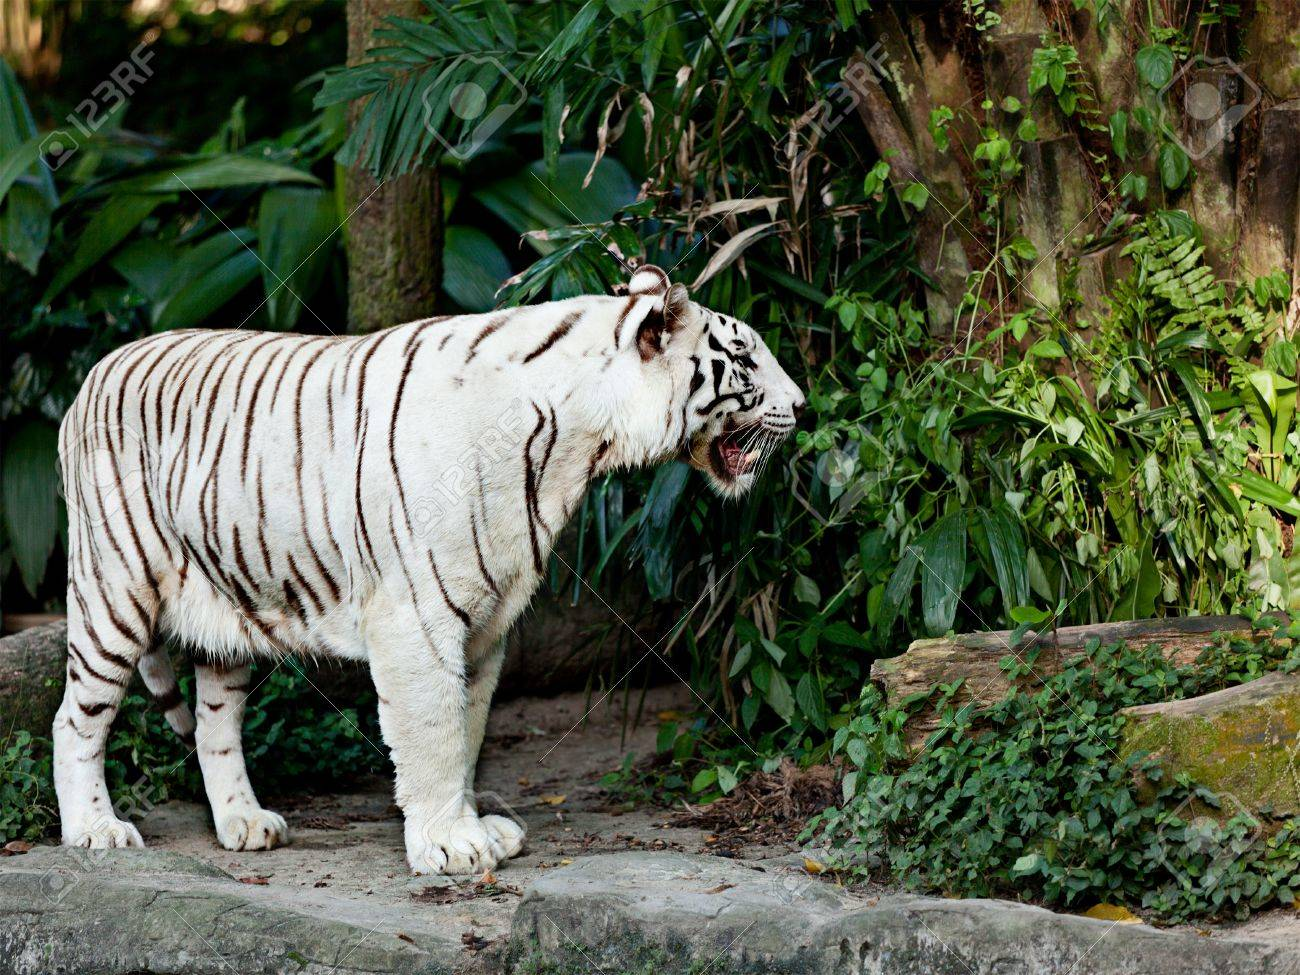 White tiger in jungles Stock Photo - 11173469